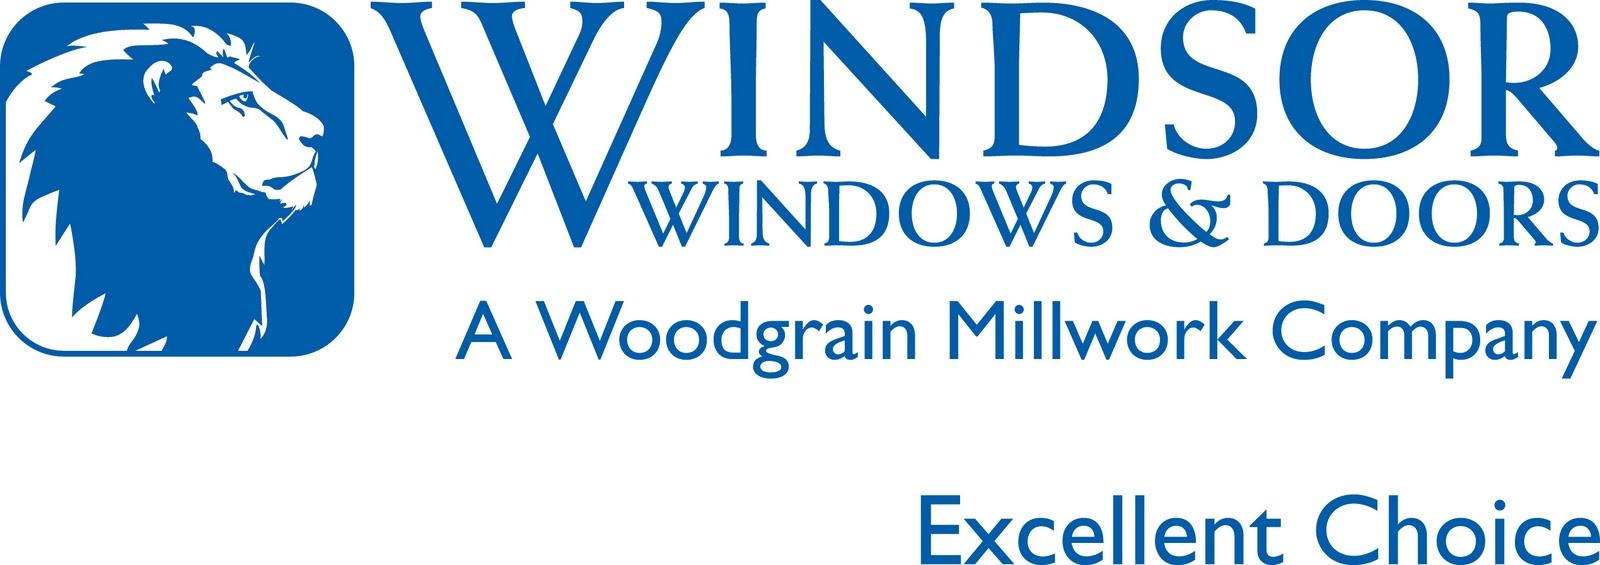 Statements Define Your Home Windsor Windows And Doors